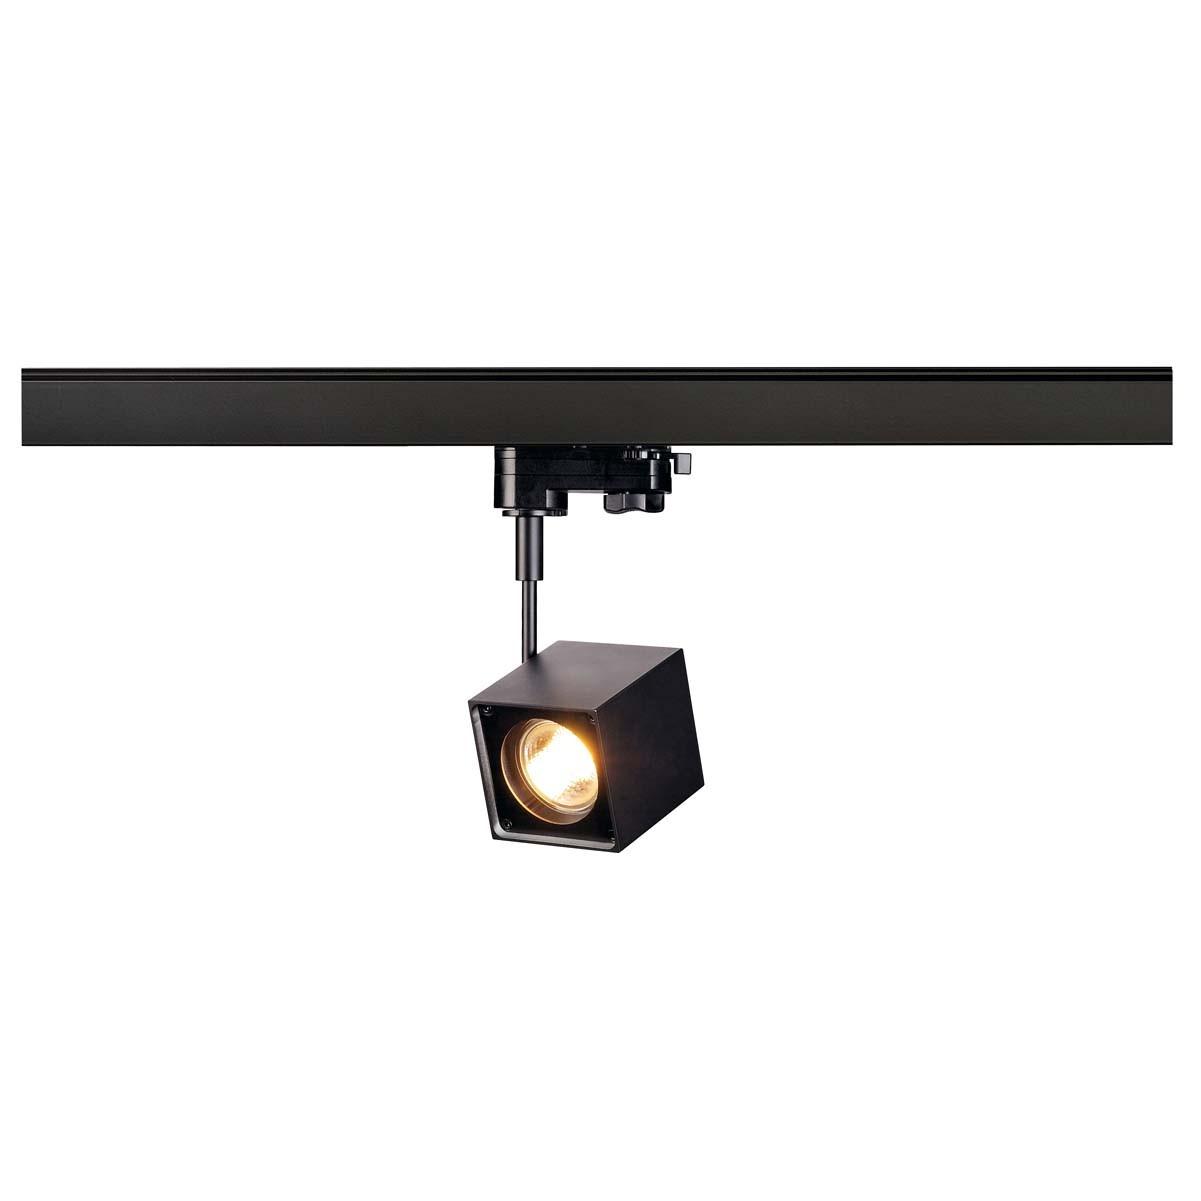 SLV 152320 Altra Dice 50W Black Eutrac 3 Circuit 240V Track Light